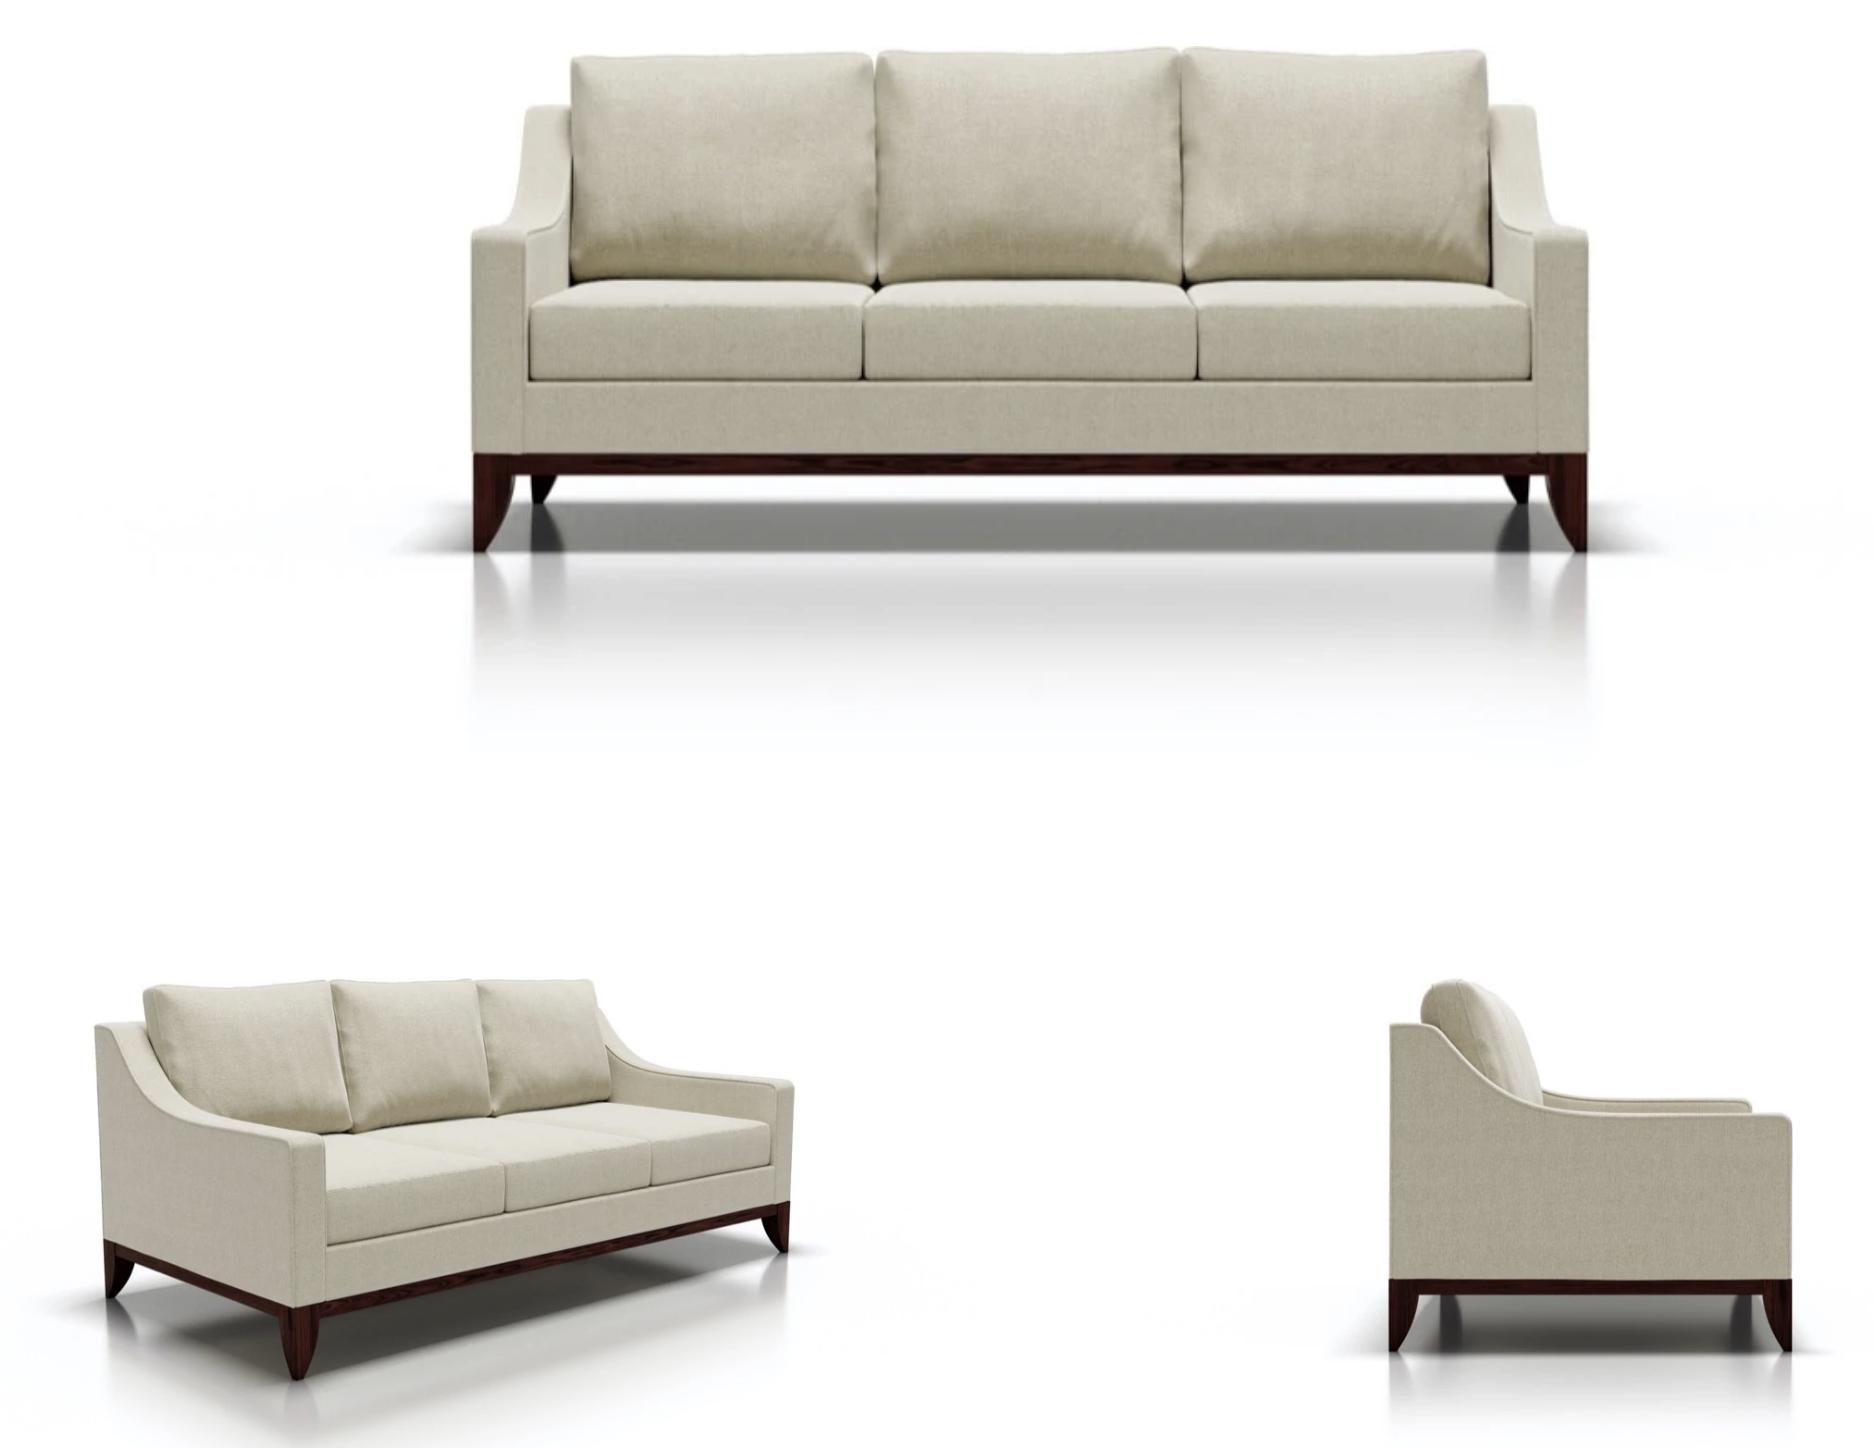 custom couches